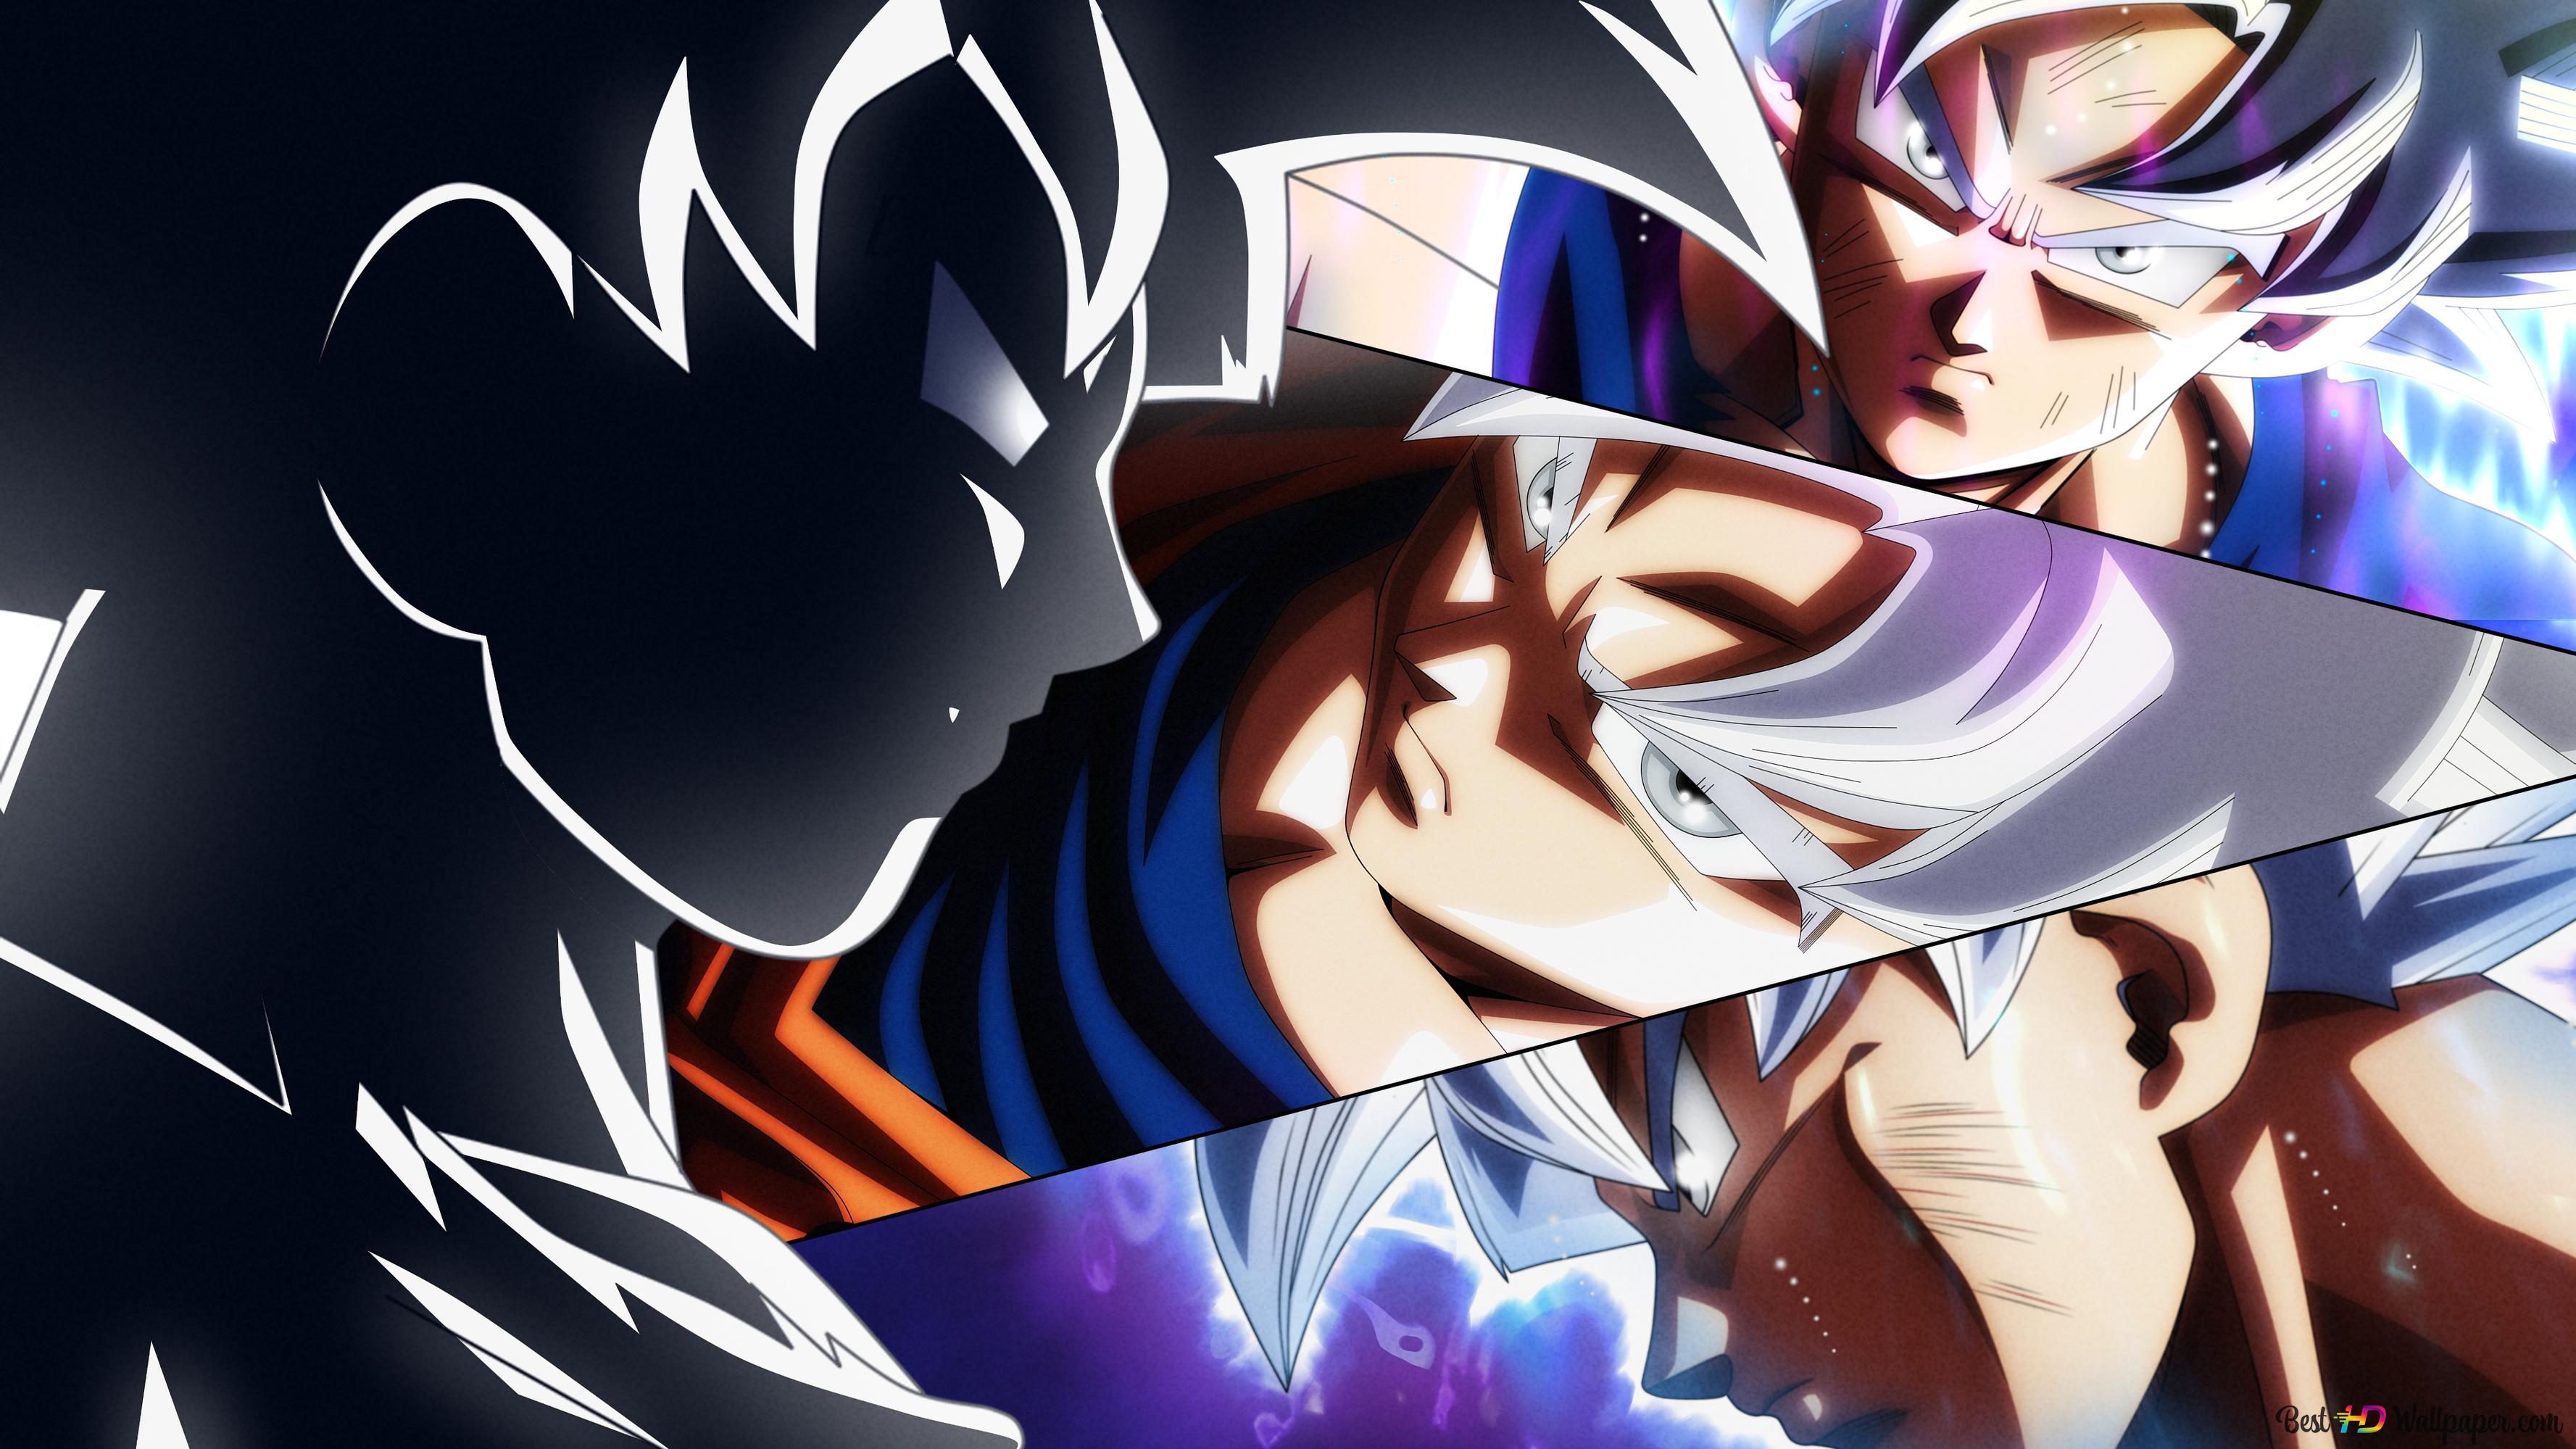 Dragon ball - goku HD wallpaper download